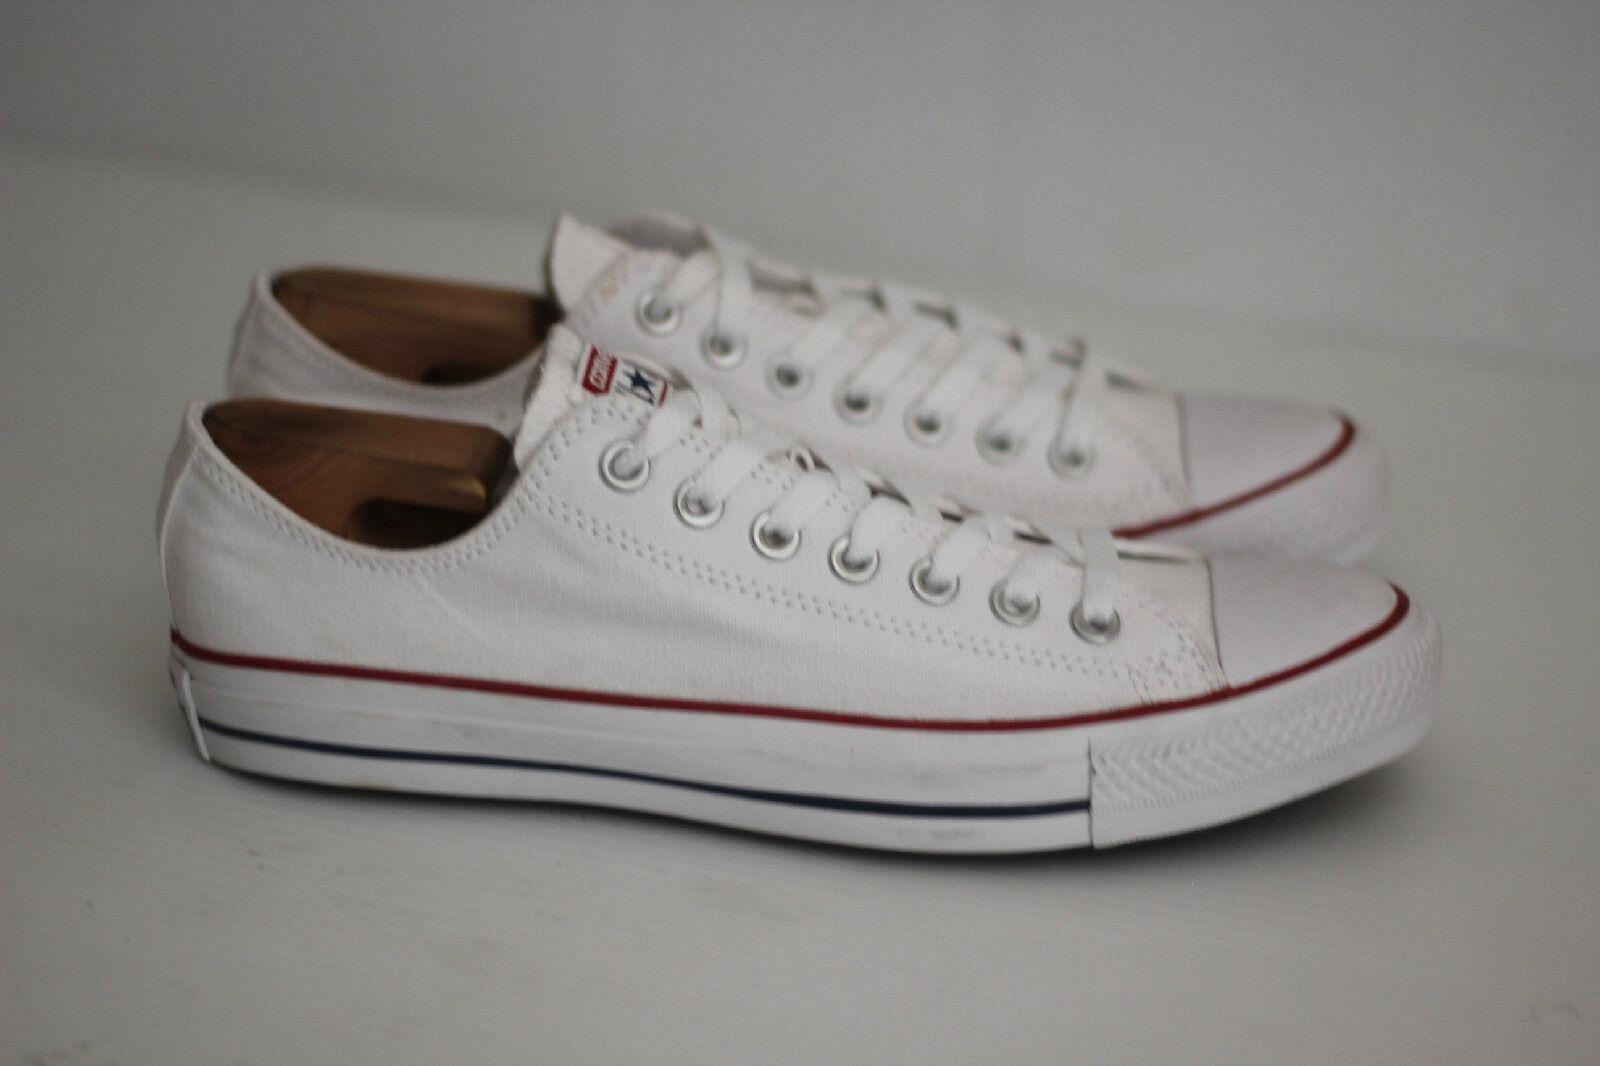 Converse chuck taylor all top - star - niedrige top all sneaker - WEISS - bequem 56ba97